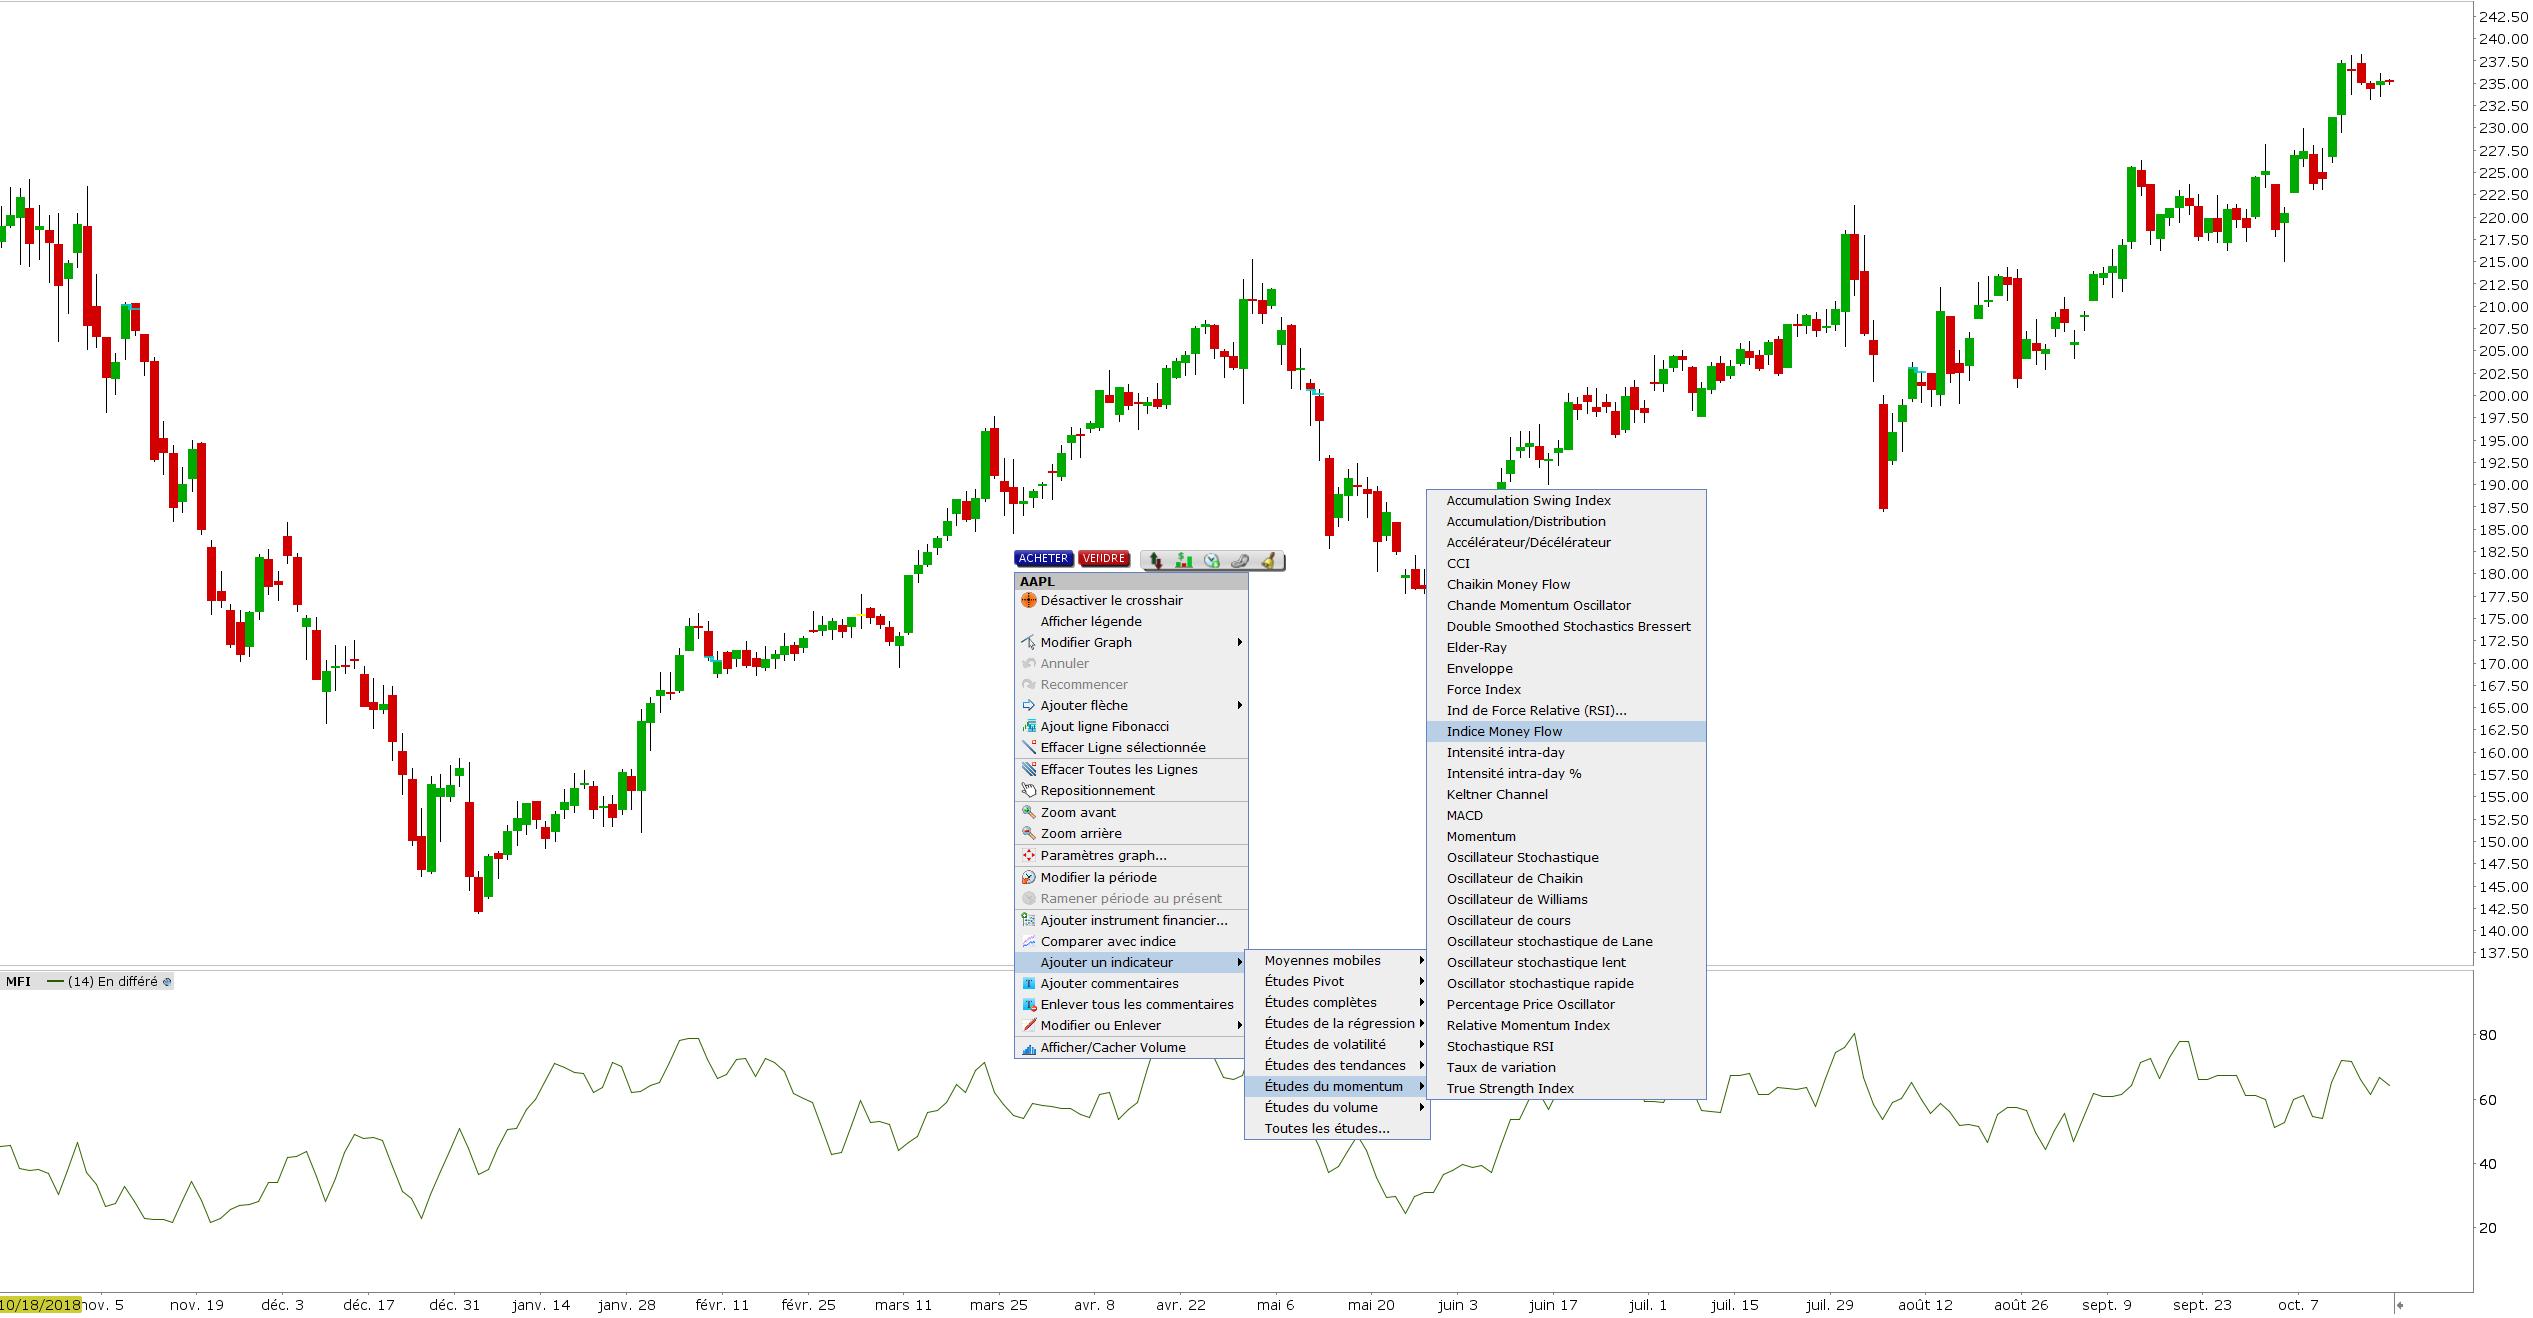 mfi money flow index plateforme LYNX - money flow index definition